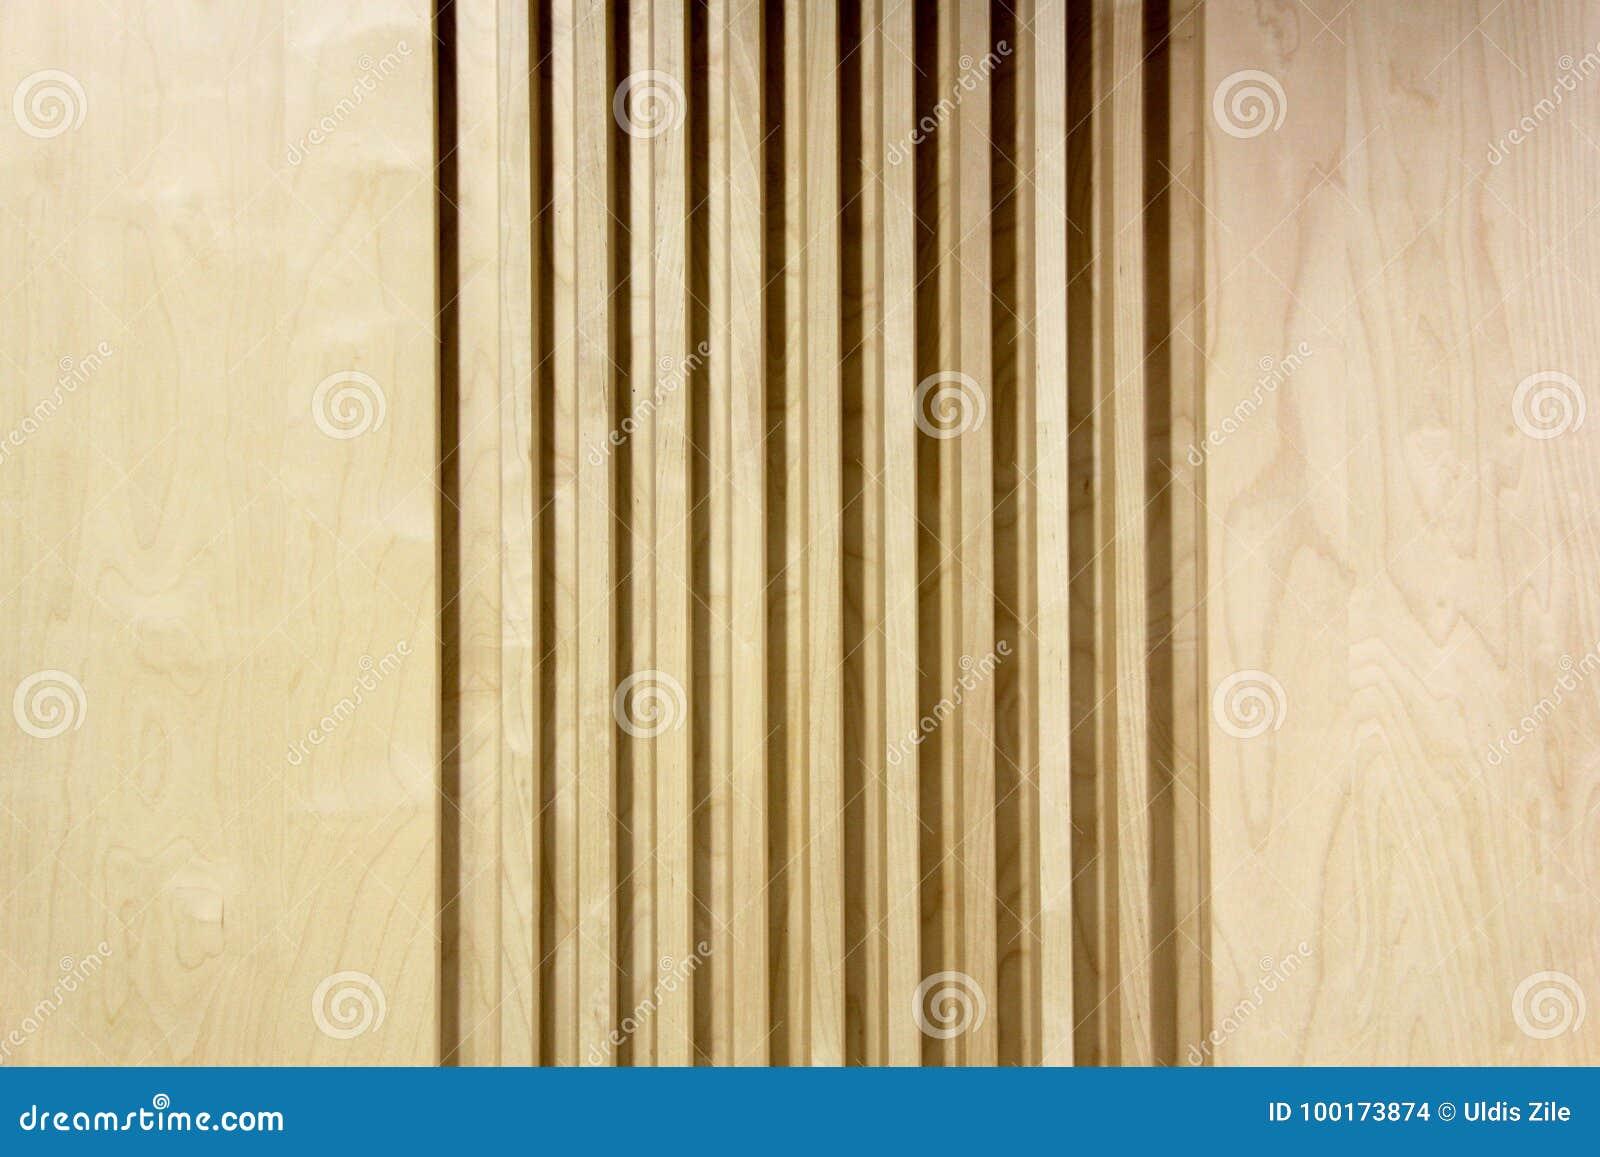 Modern Architecture Wood Tree Decorative Panels Stock Photo - Image ...